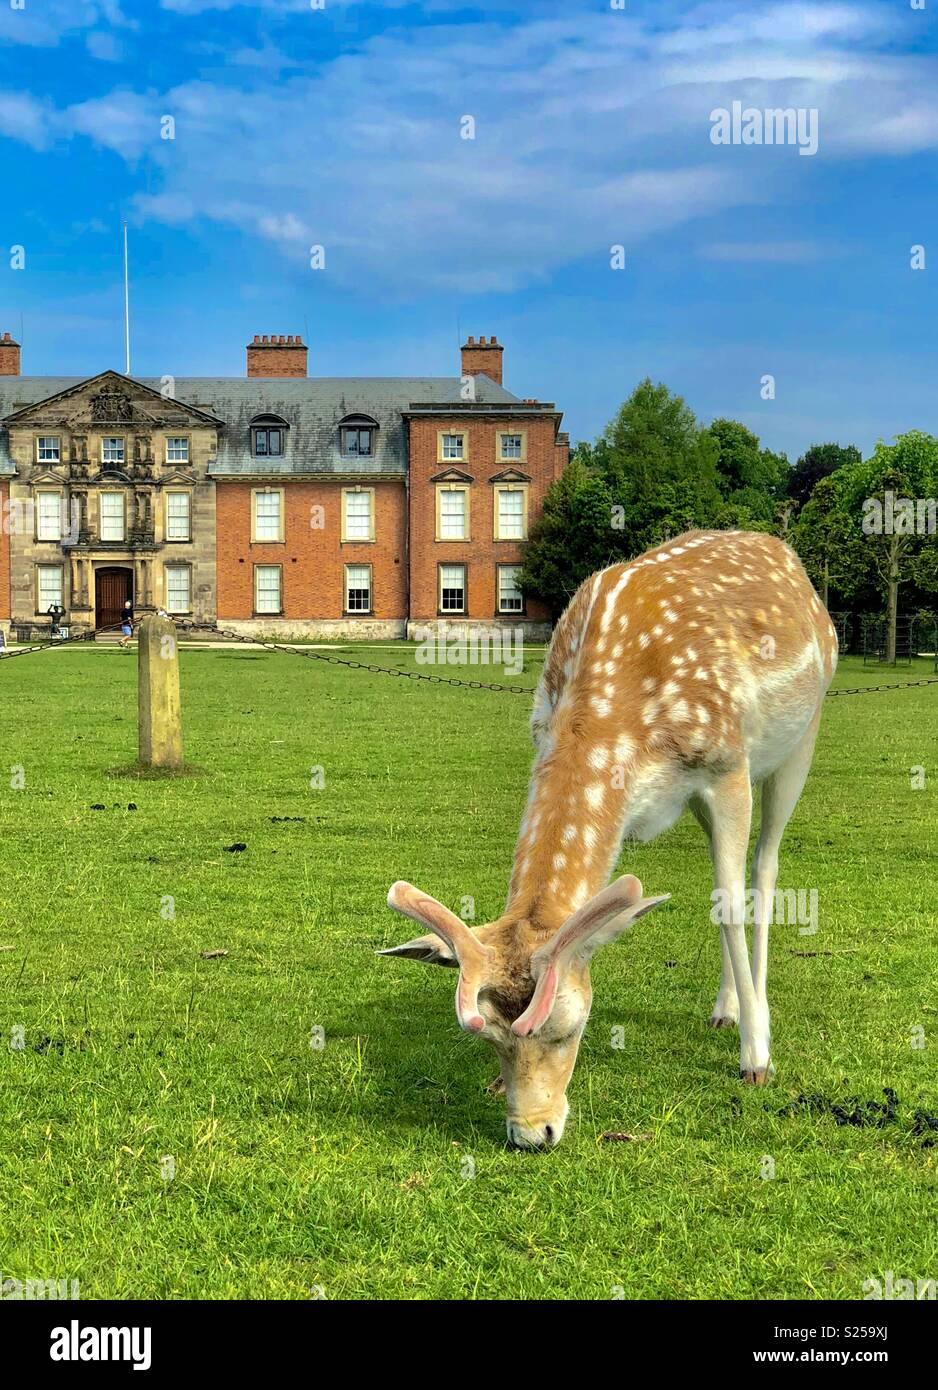 Fallow Deer at Dunham Massey, Cheshire. May 2018 - Stock Image